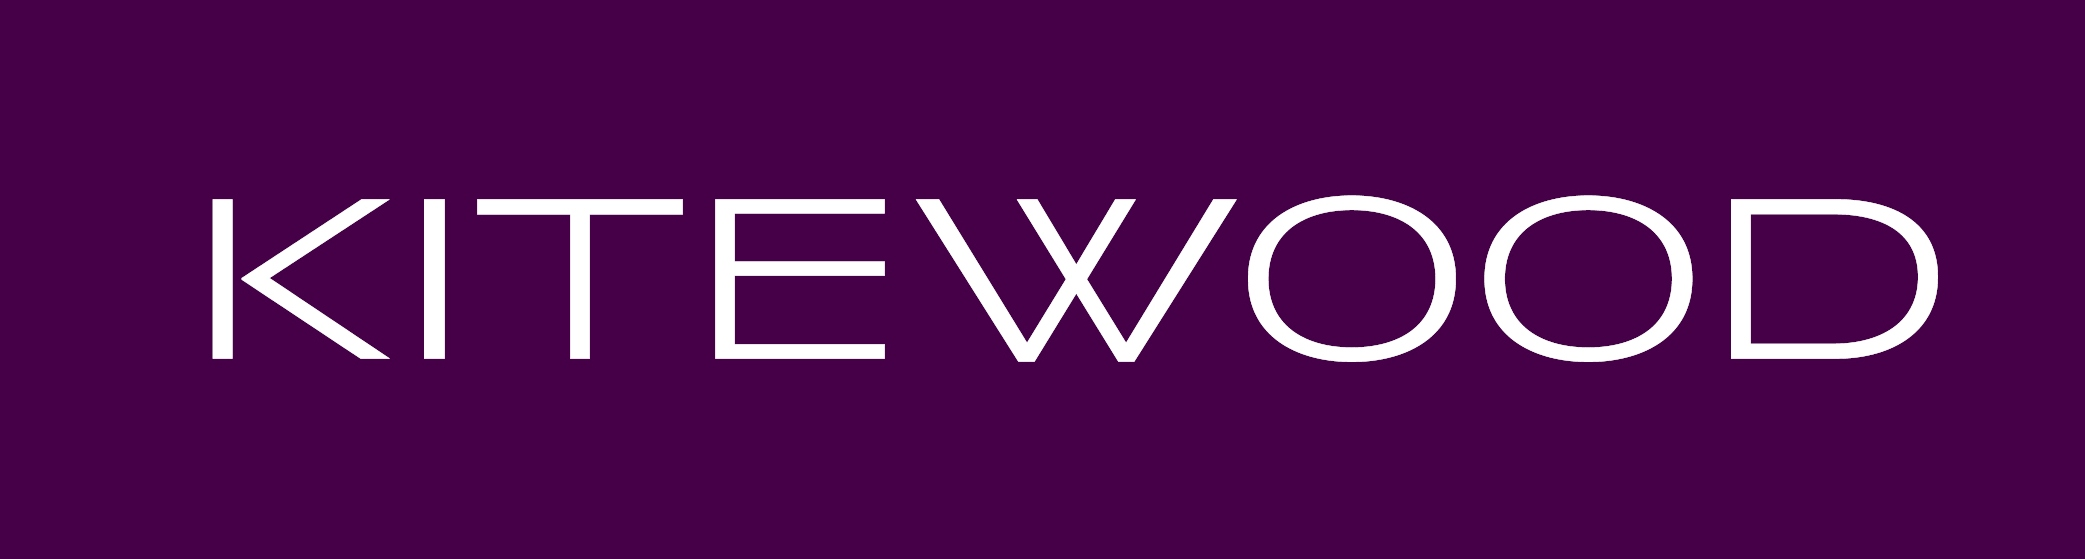 Image of Kitewood logo